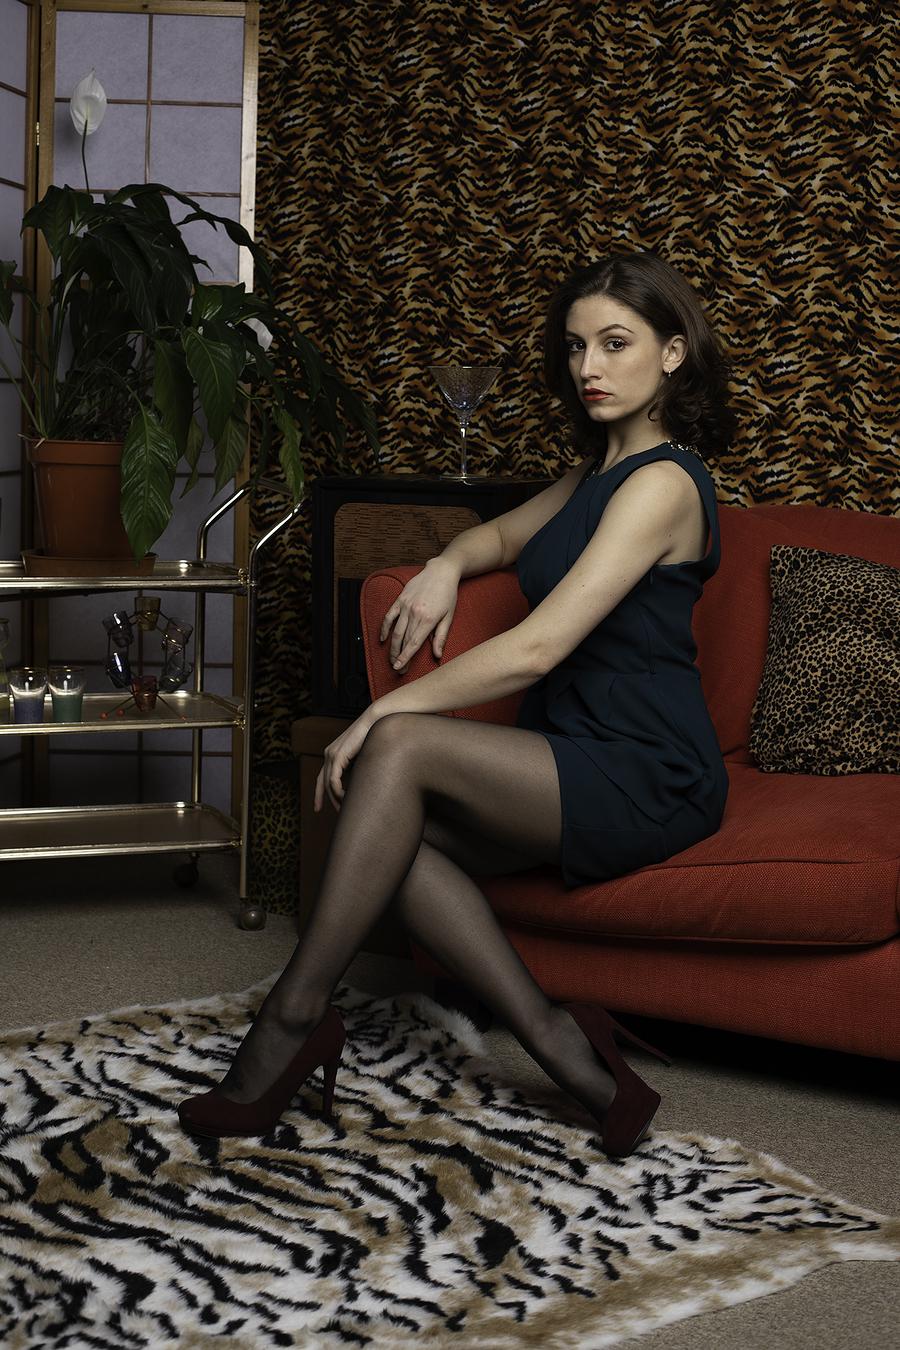 Looking elegant in the lounge / Photography by Inspire Studios Ltd, Model BOou, Taken at Inspire Studios Ltd / Uploaded 12th April 2019 @ 07:58 PM